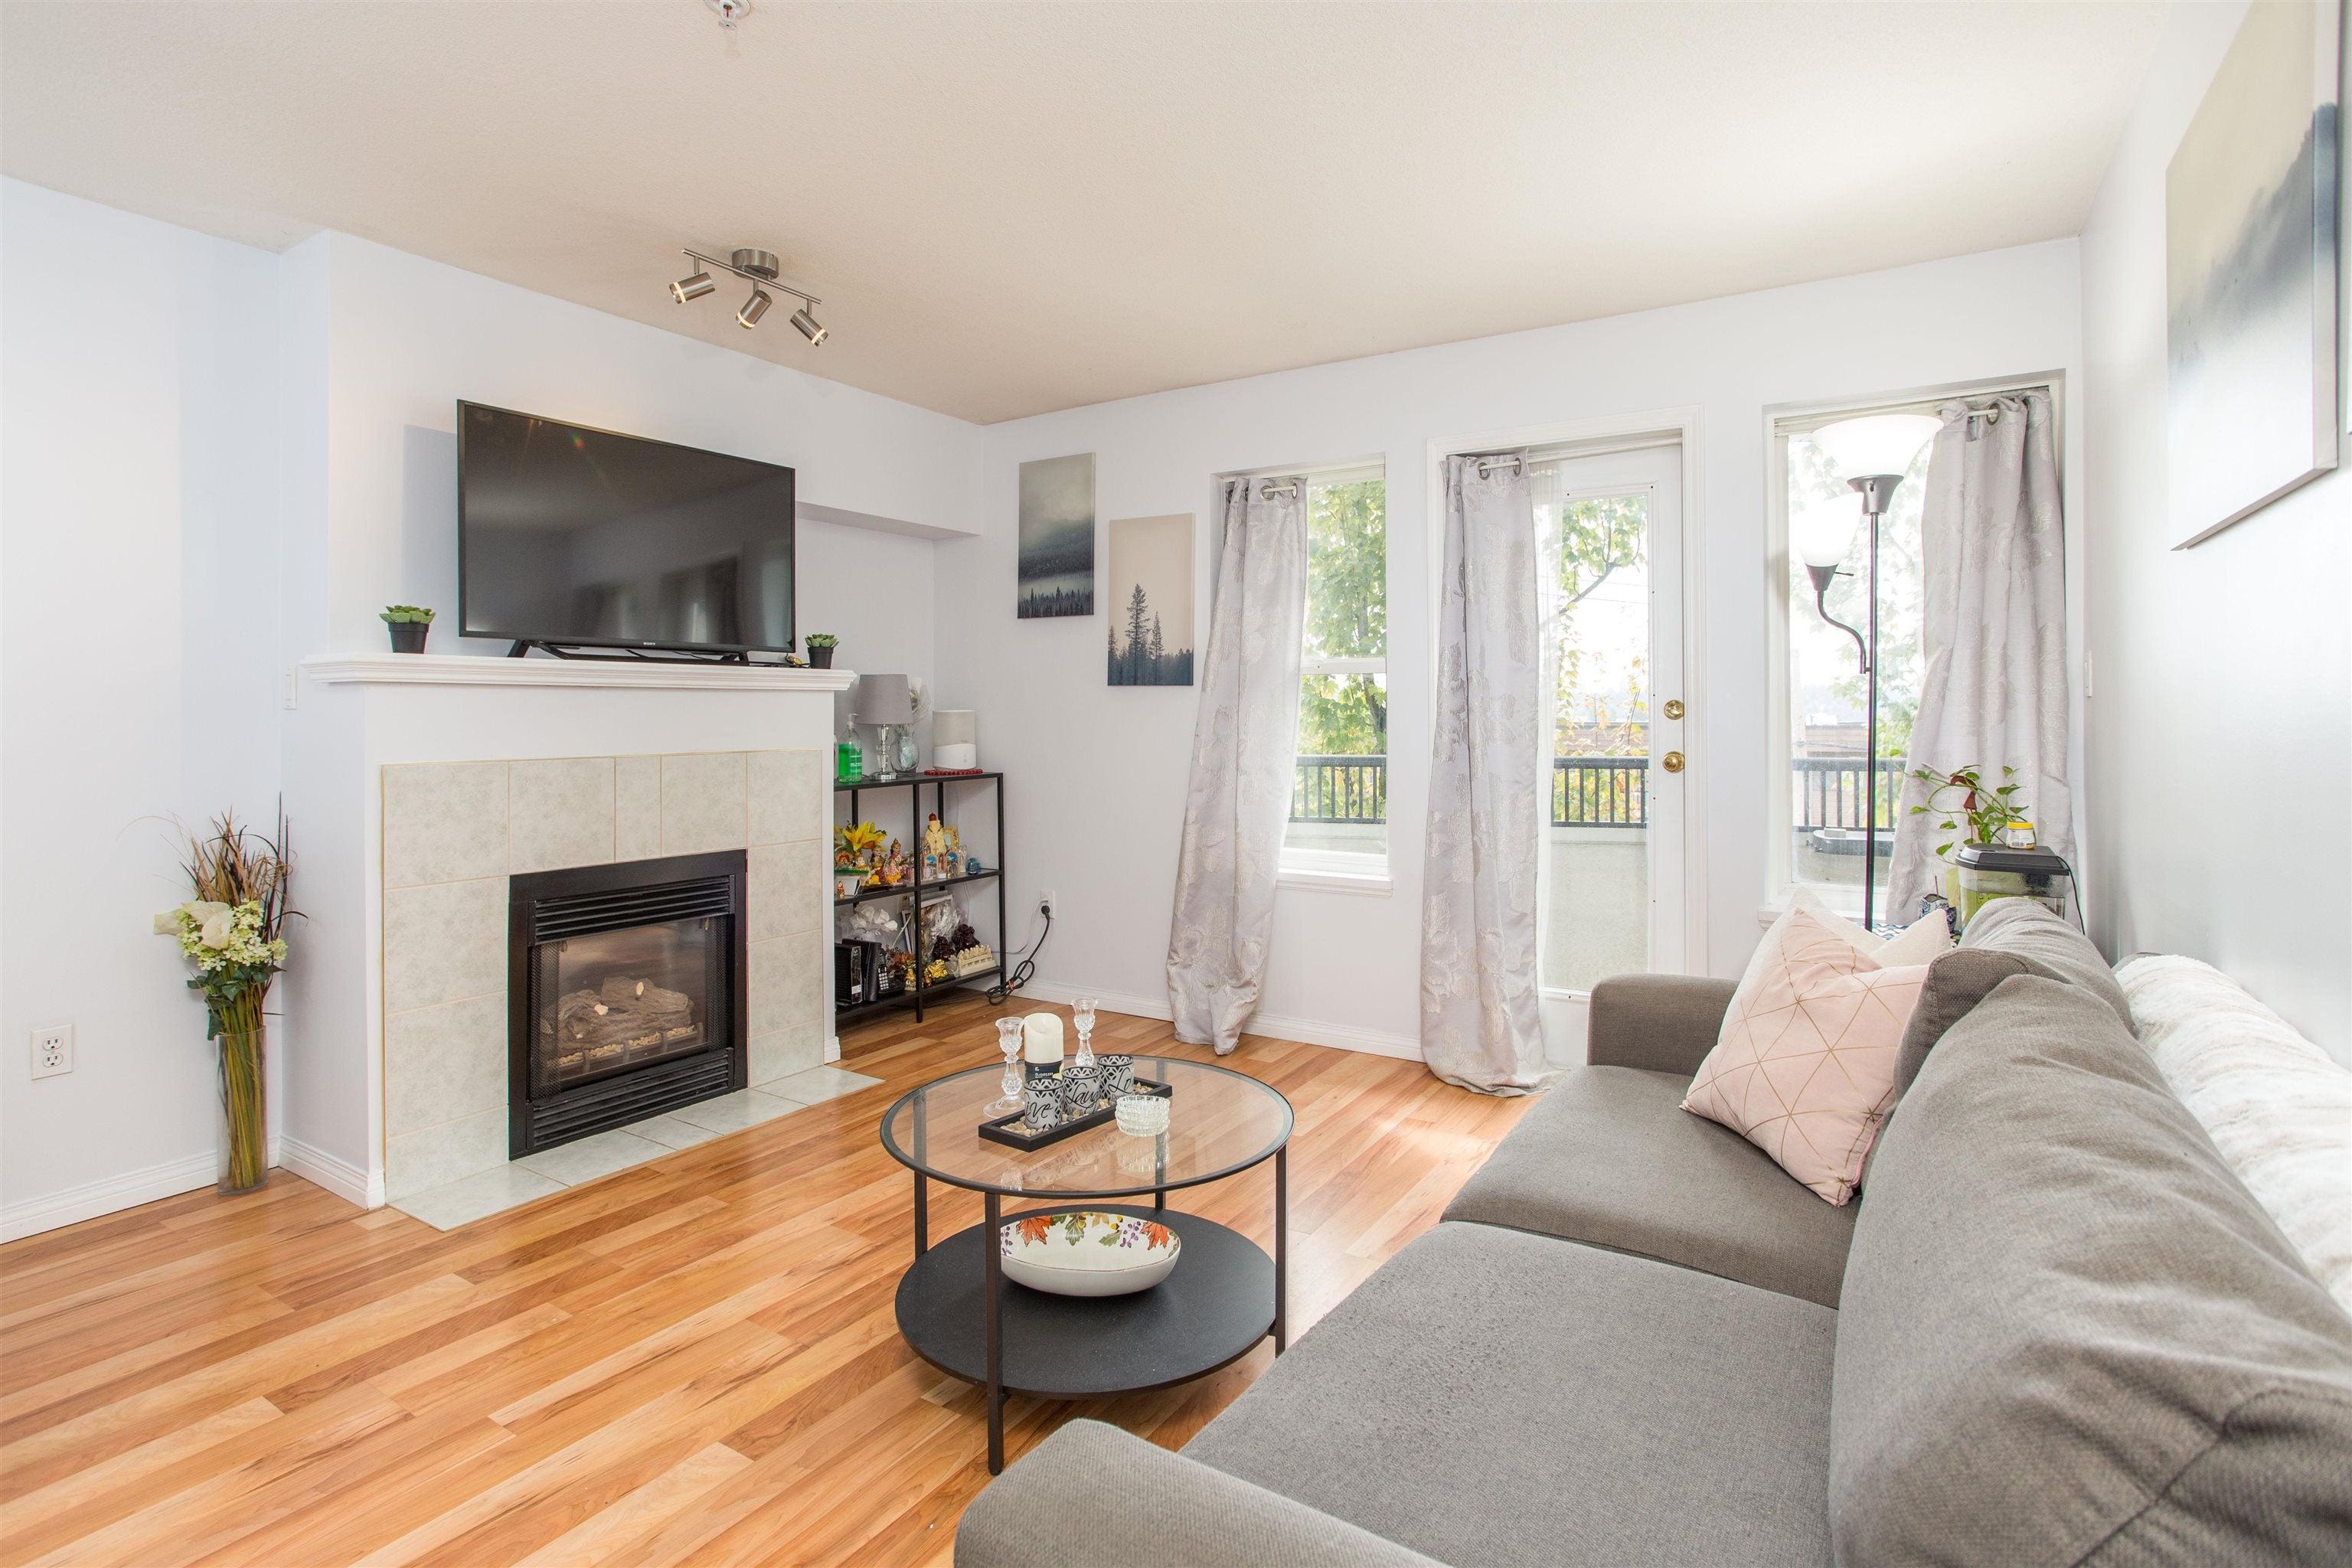 7 205 LEBLEU STREET - Maillardville Apartment/Condo for sale, 3 Bedrooms (R2625671) - #1